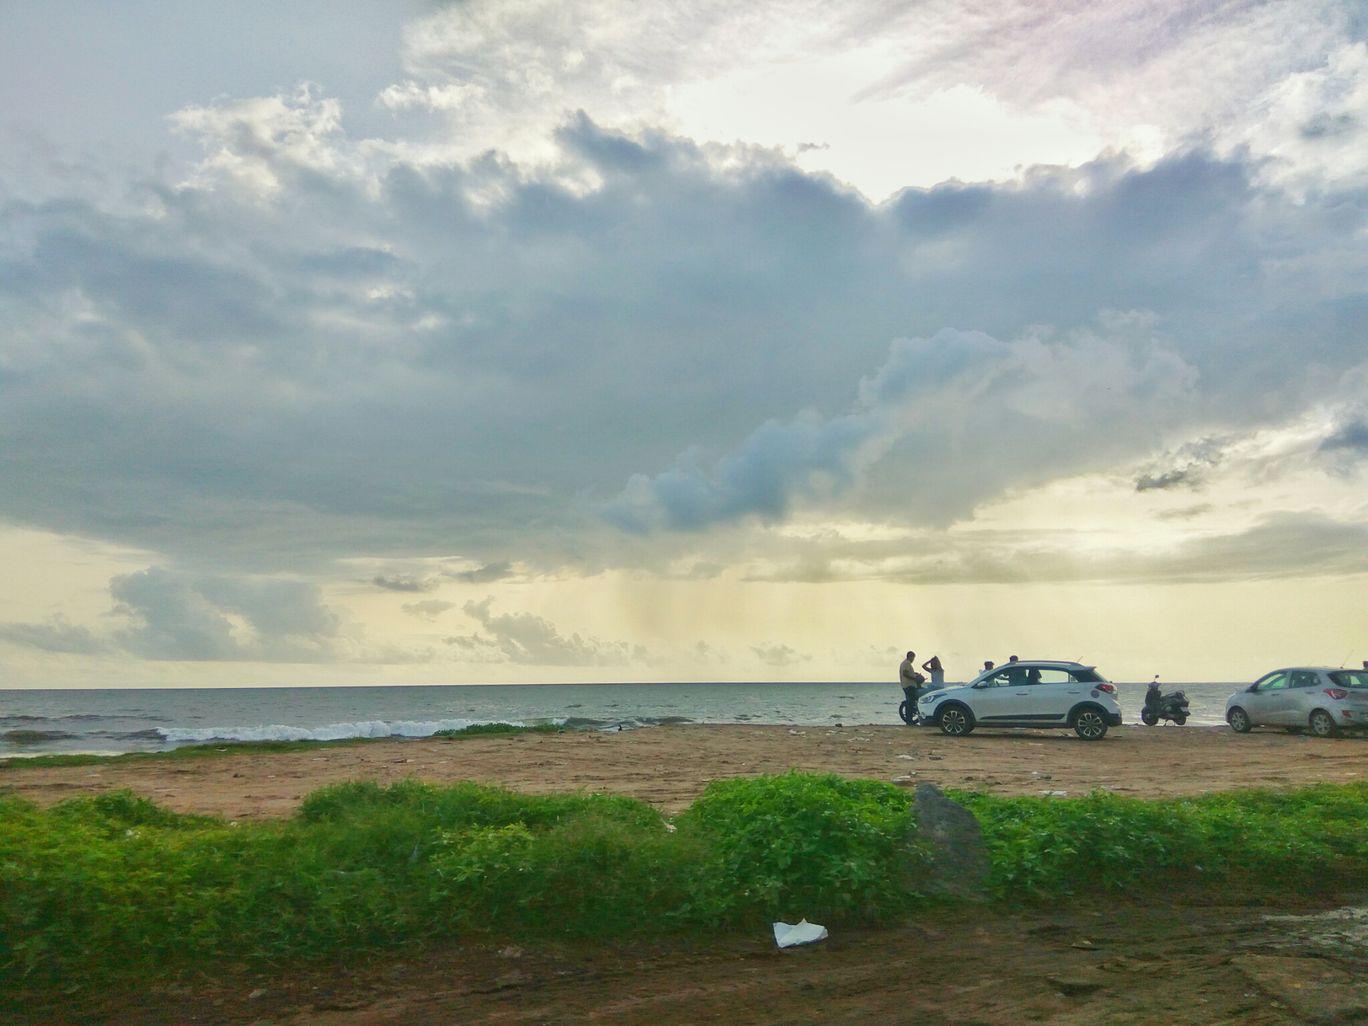 Photo of Kozhikode Beach By Nabeel Bin Basheer